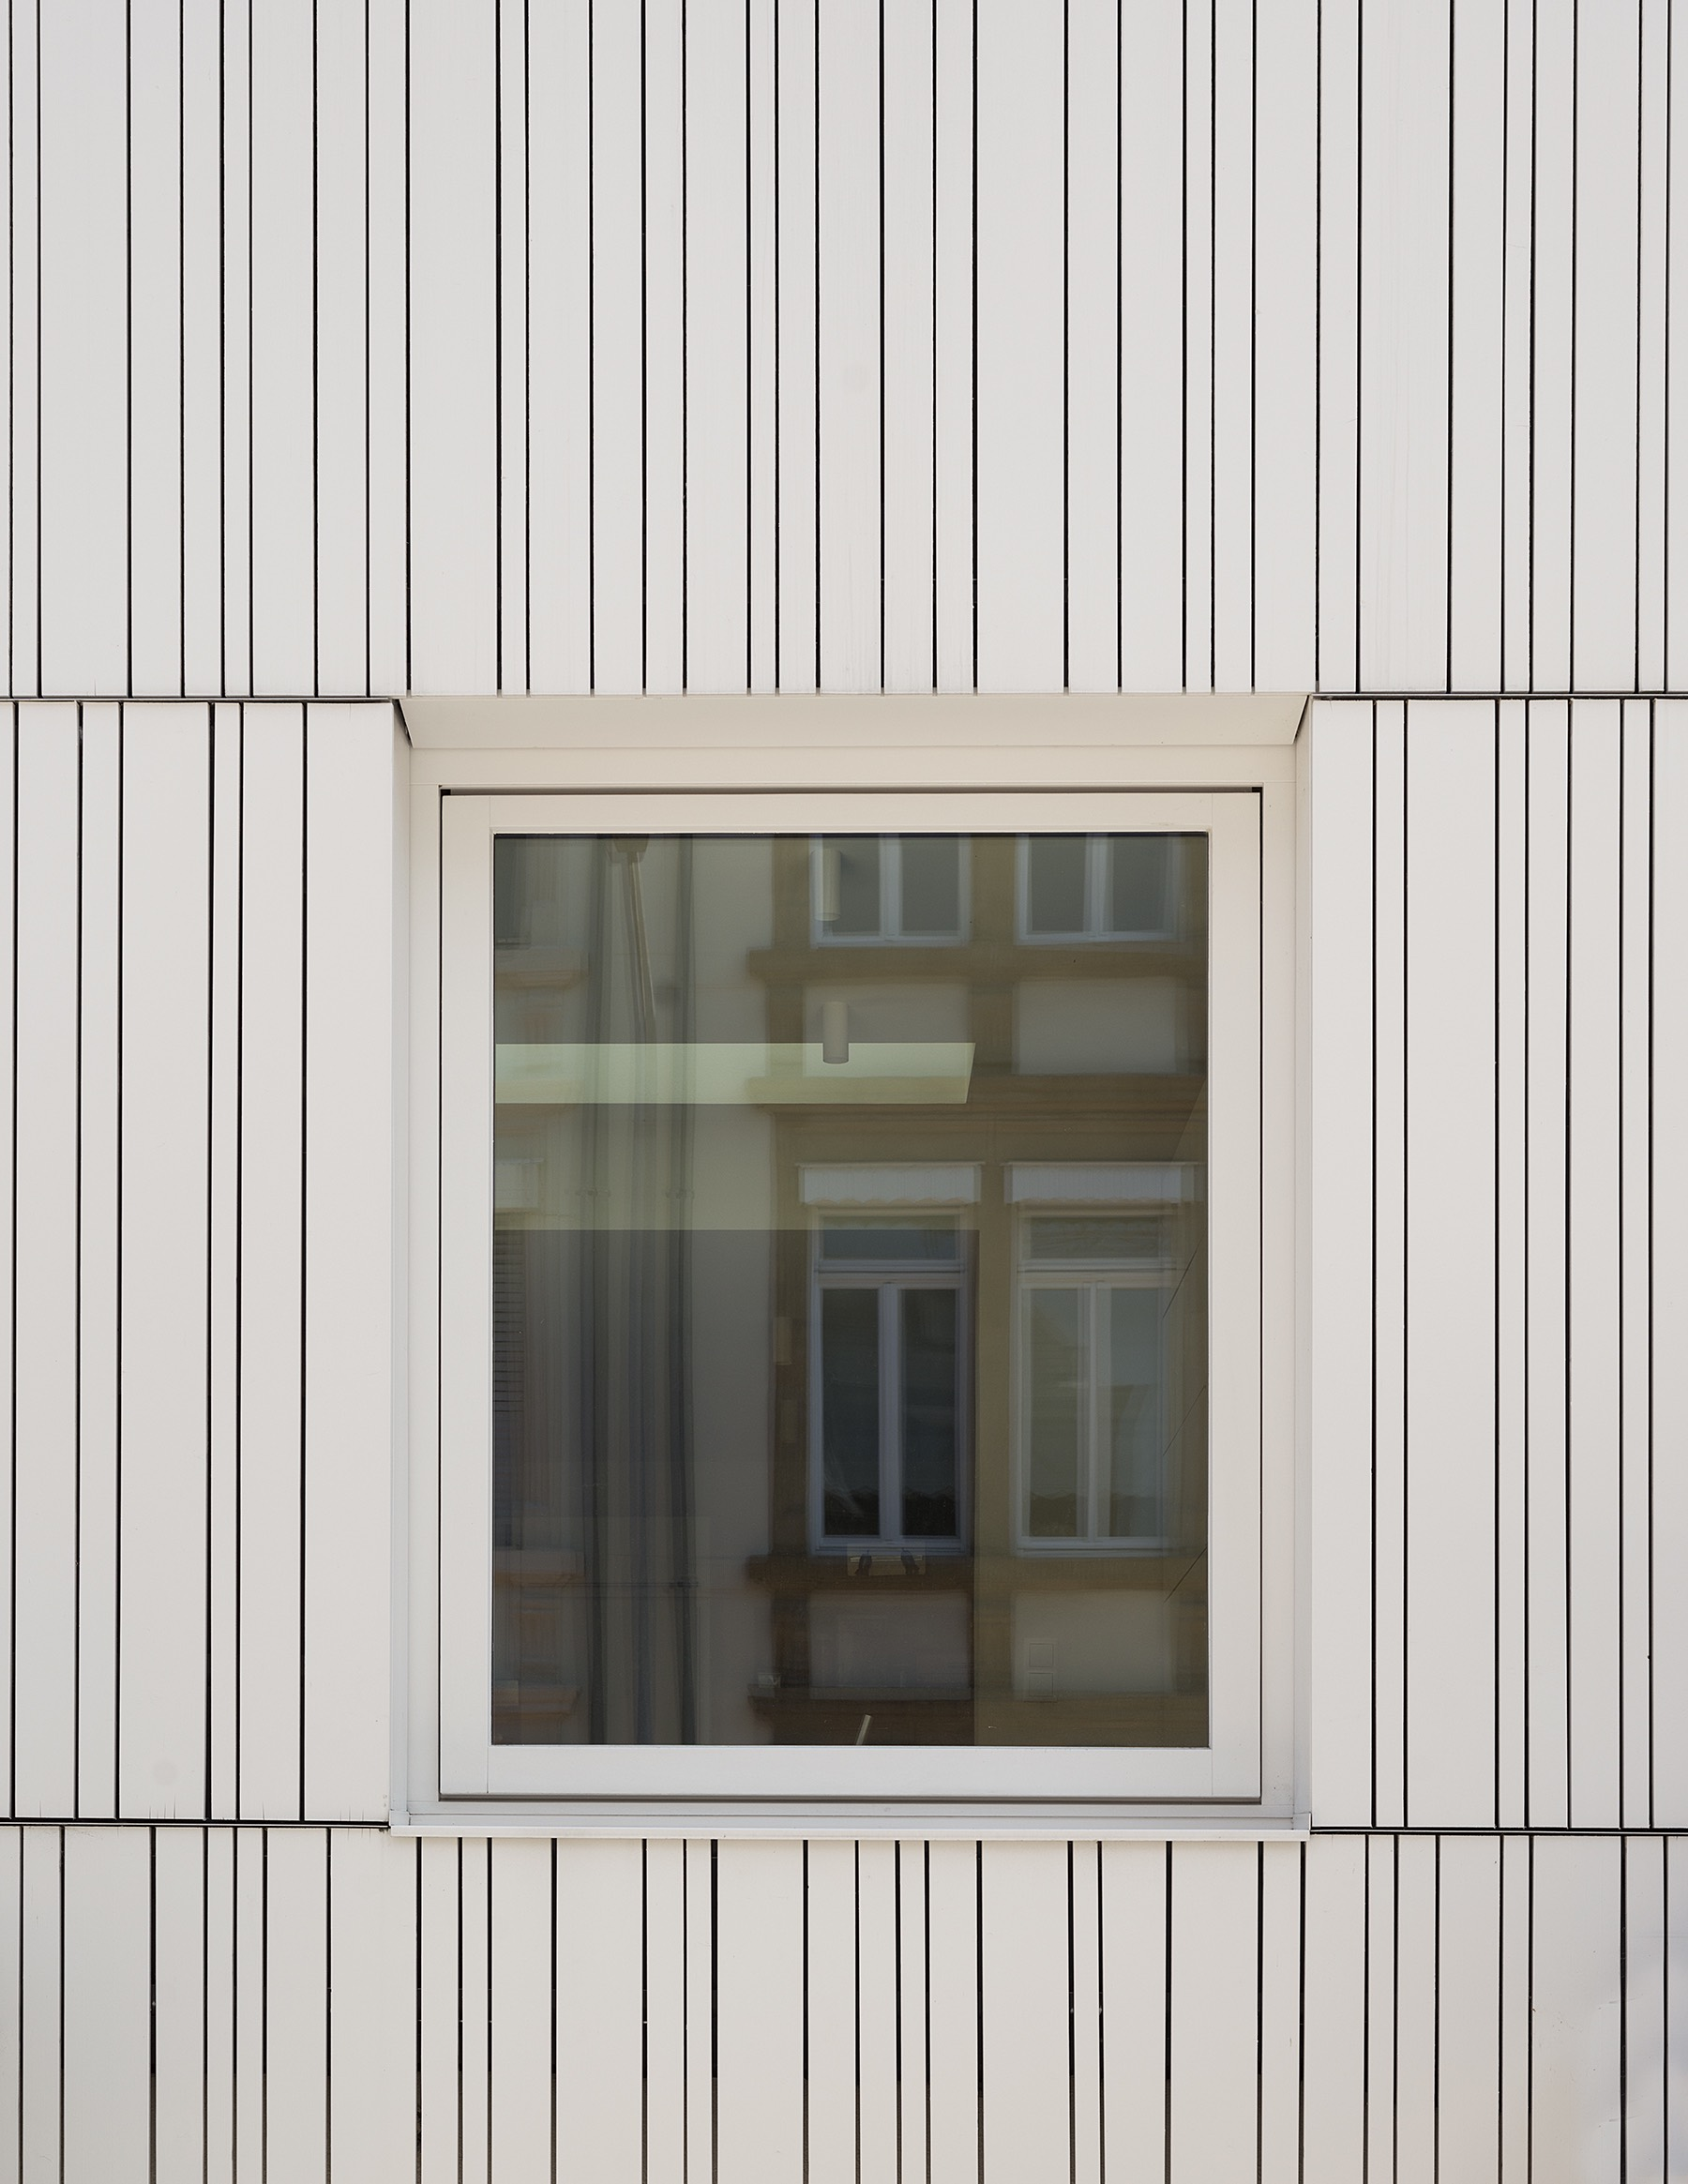 095_maison à limpertsberg_bossi_internet_04.jpg